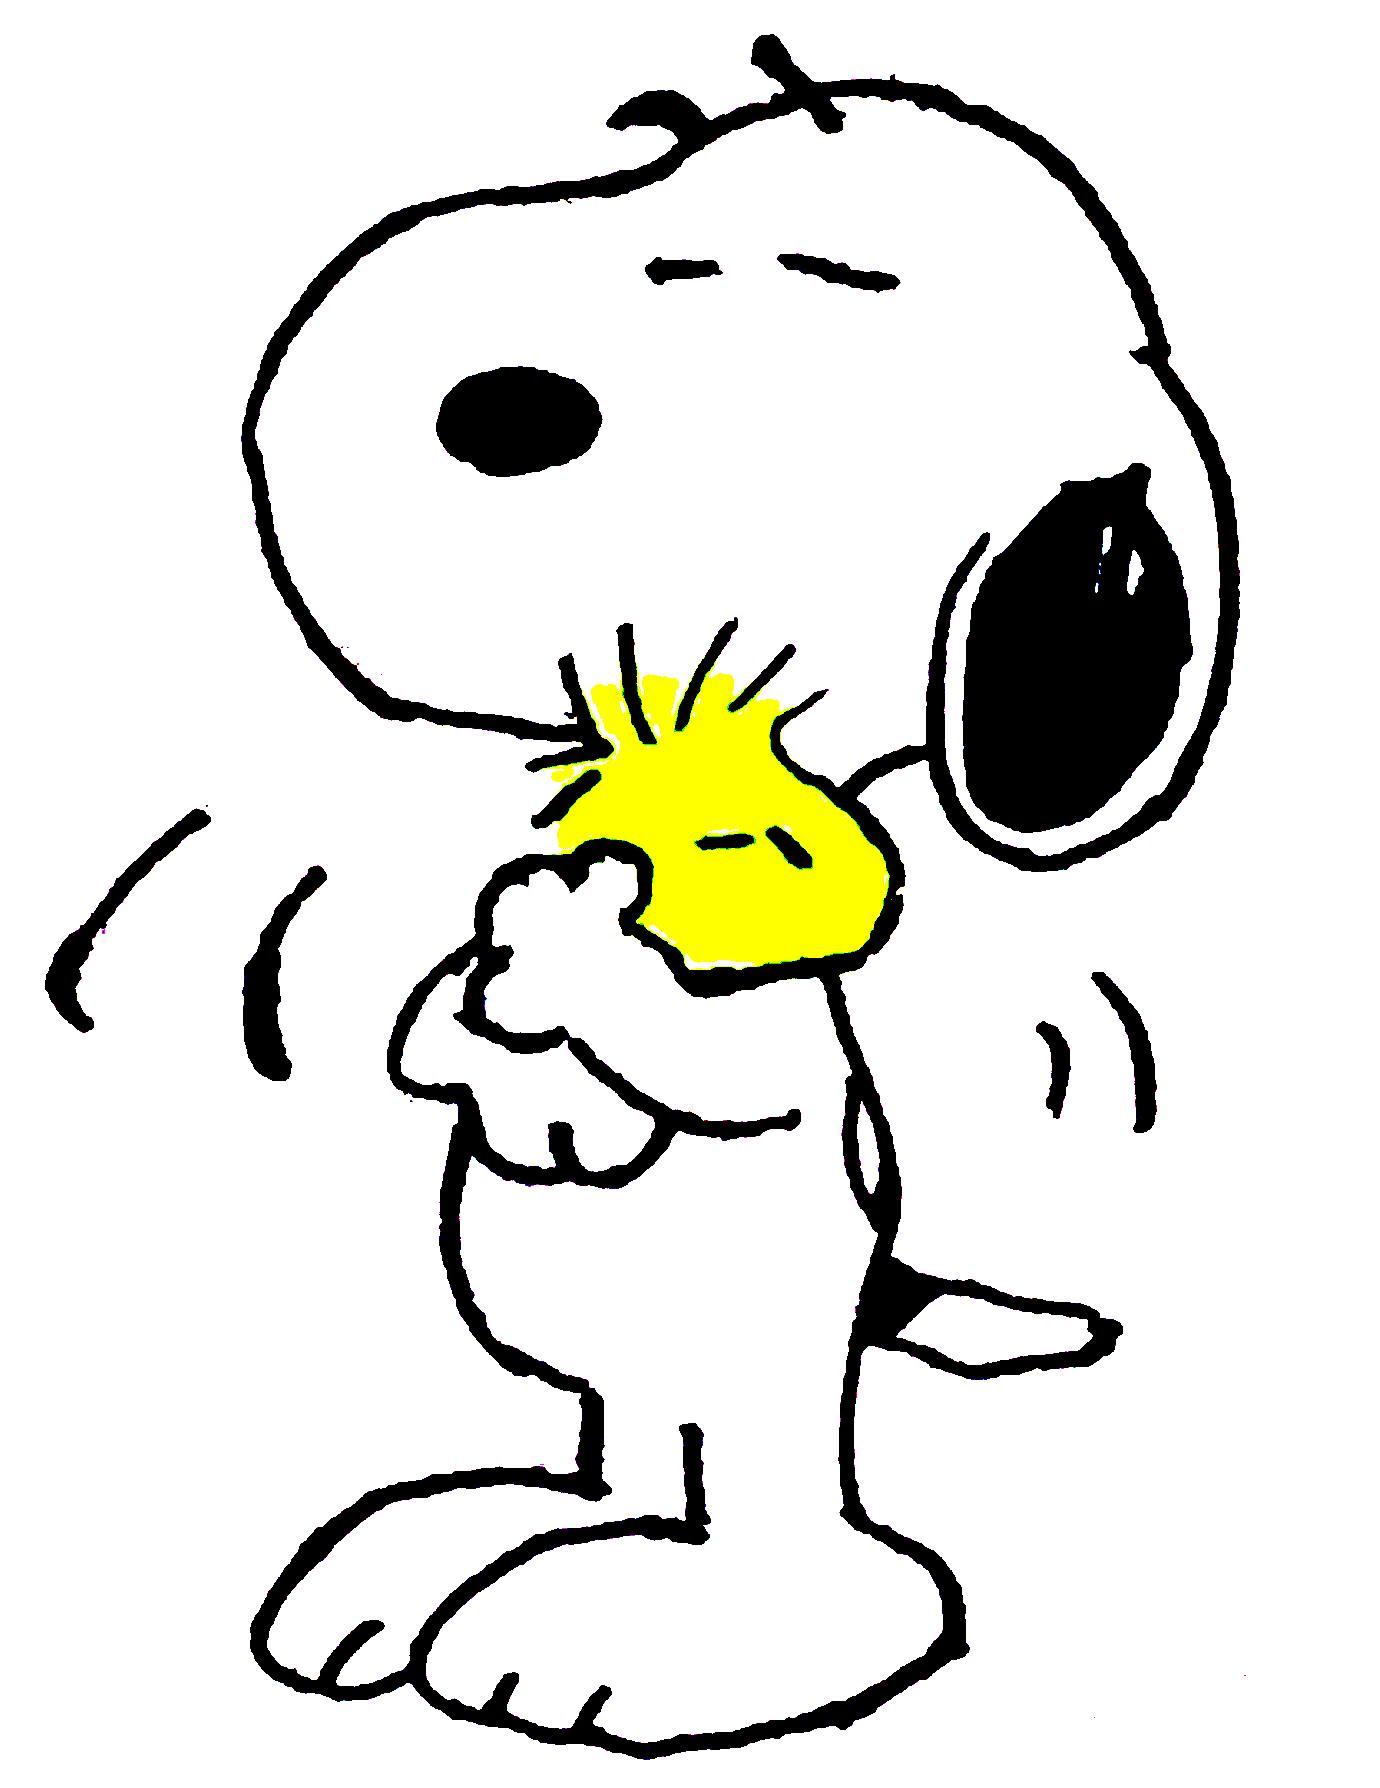 1380x1788 Snoopy Woodstock Drawing By Bradsnoopy97